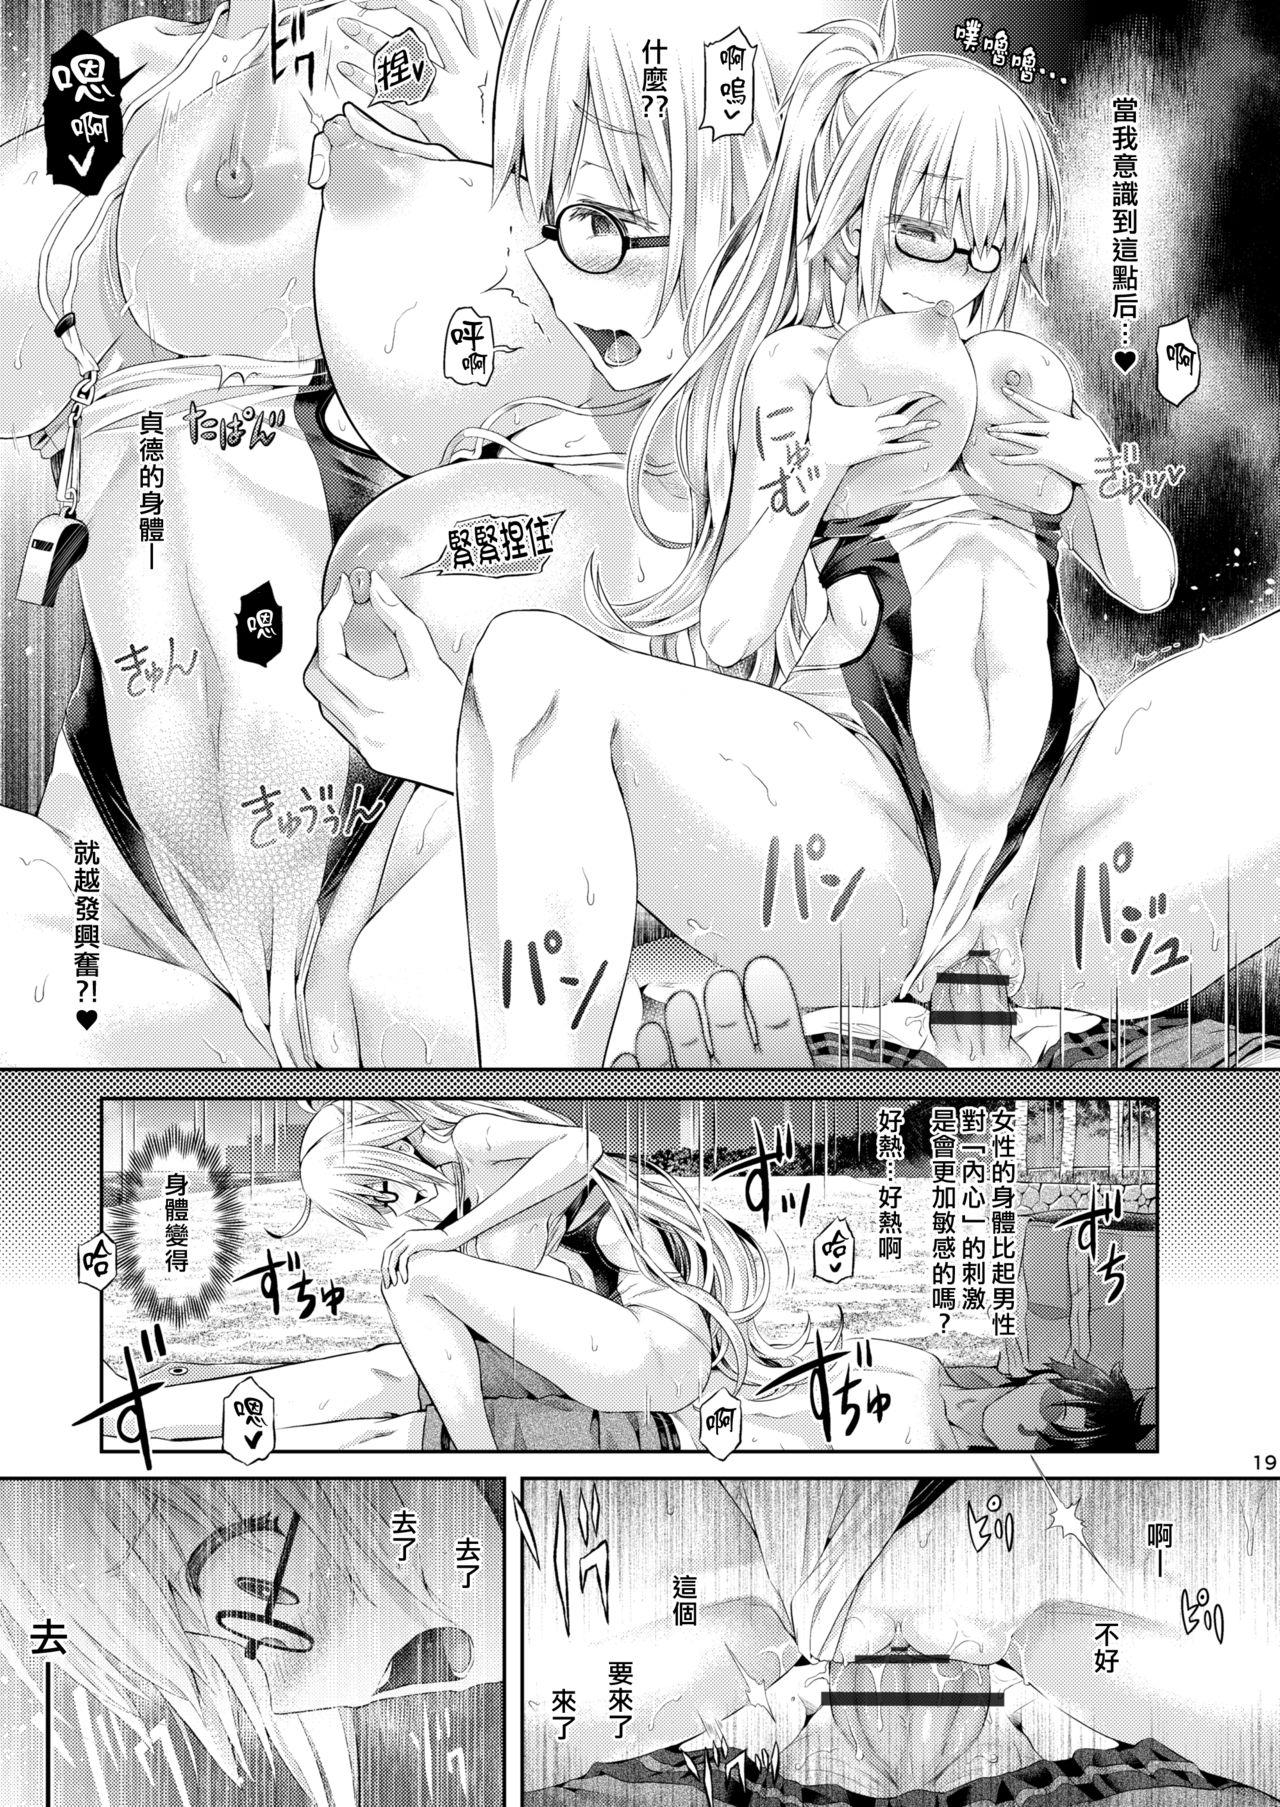 [Dschinghis Khan no Tamanegi wa Ore no Yome (Taniguchi-san)] Kimi -Jeanne d'Arc- ni Naru 2 (Fate/Grand Order) [Chinese] [熊崎玉子汉化组] [Digital] 19